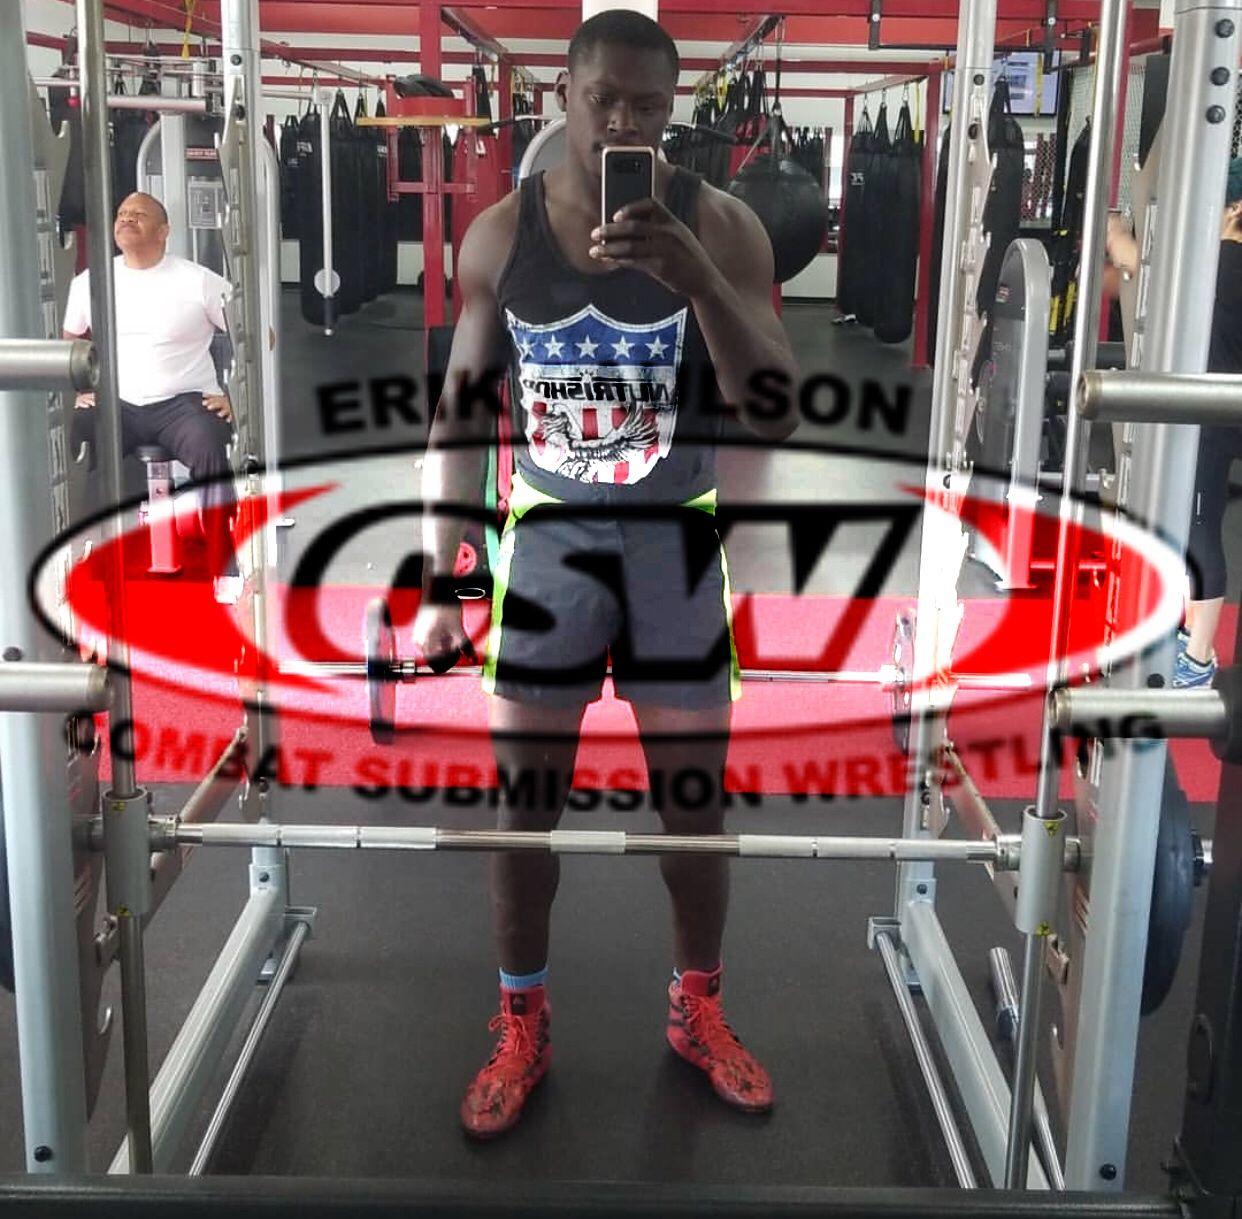 Csw Mma Ufc Curtis Millender Jiu Jitsu Gym Mma Gym Kickboxing Classes